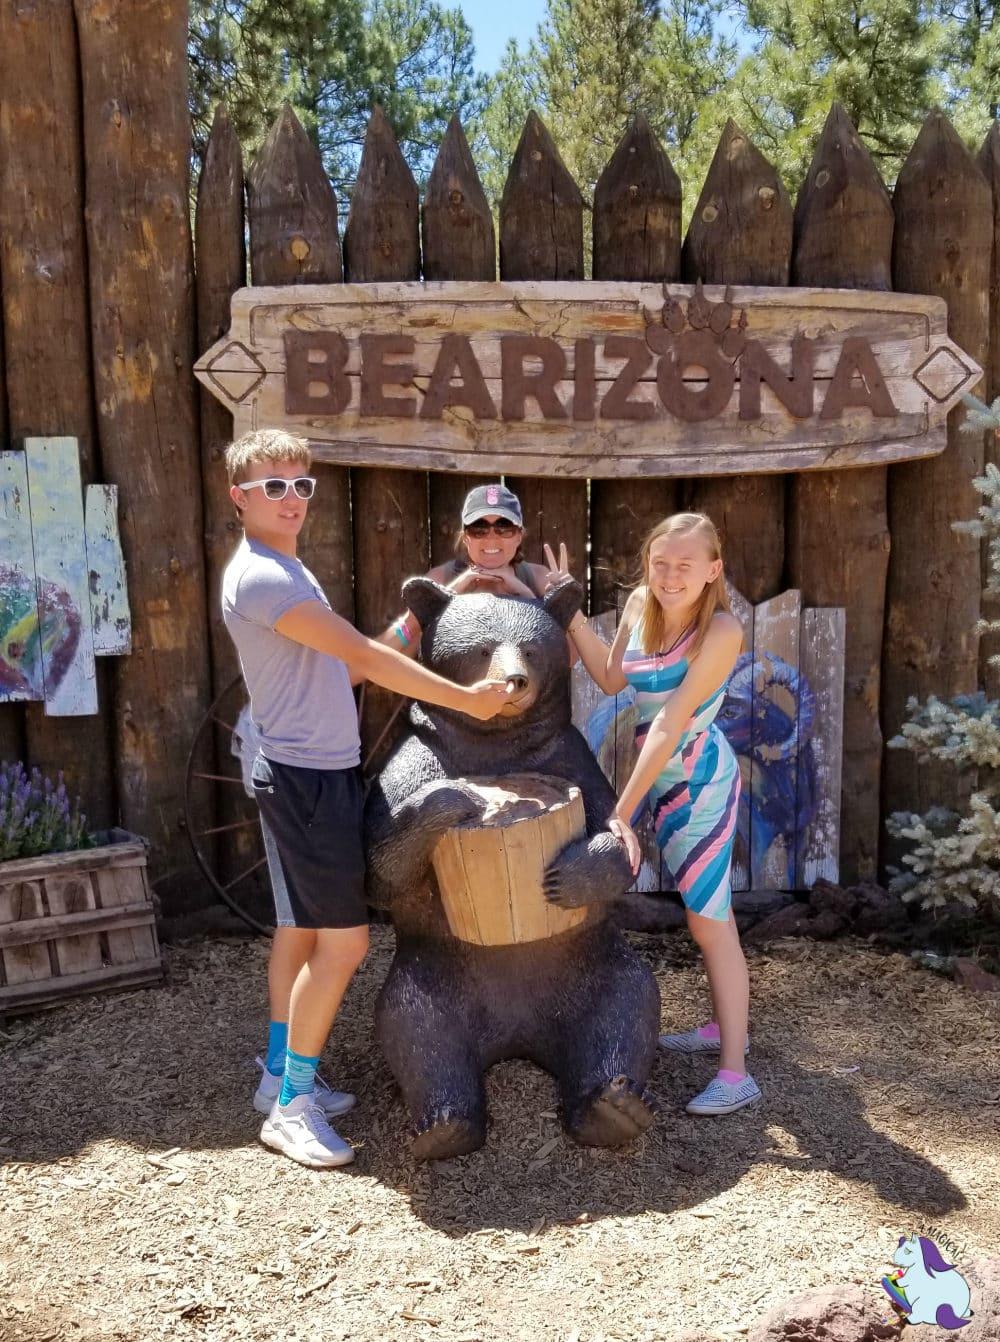 Bearizona is a drive thru zoo just half an hour from Little America Hotel in Flagstaff, AZ